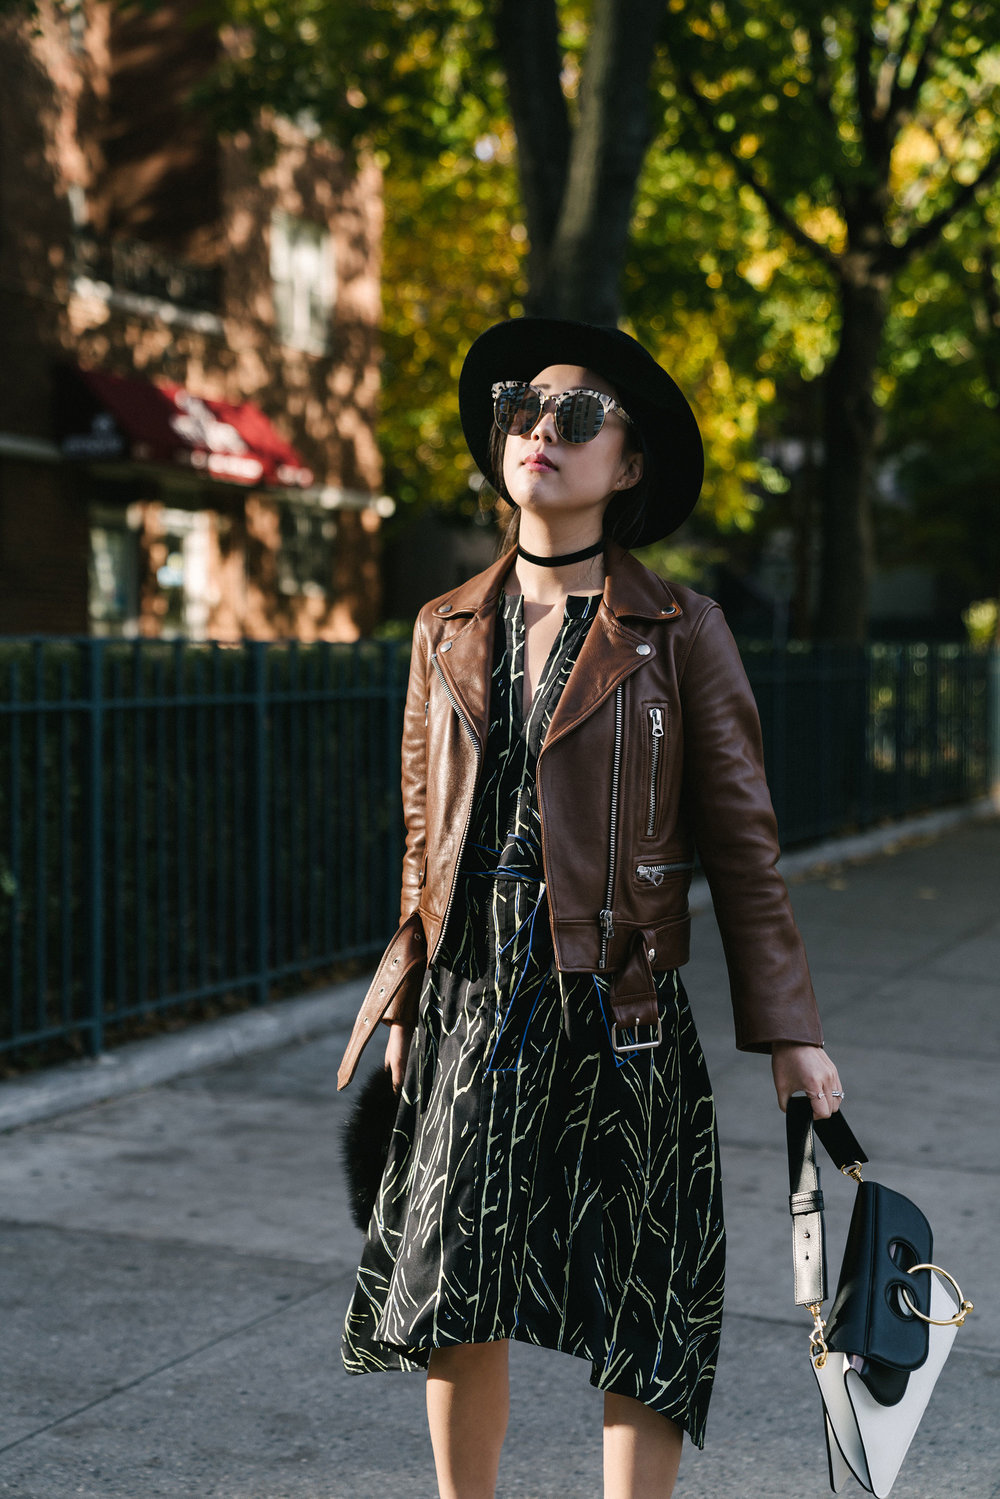 Acne Studios Jacket, Proenza Schouler Dress, Alexander Wang Boots, J.W.Anderson Bag, Janessa Leone Hat